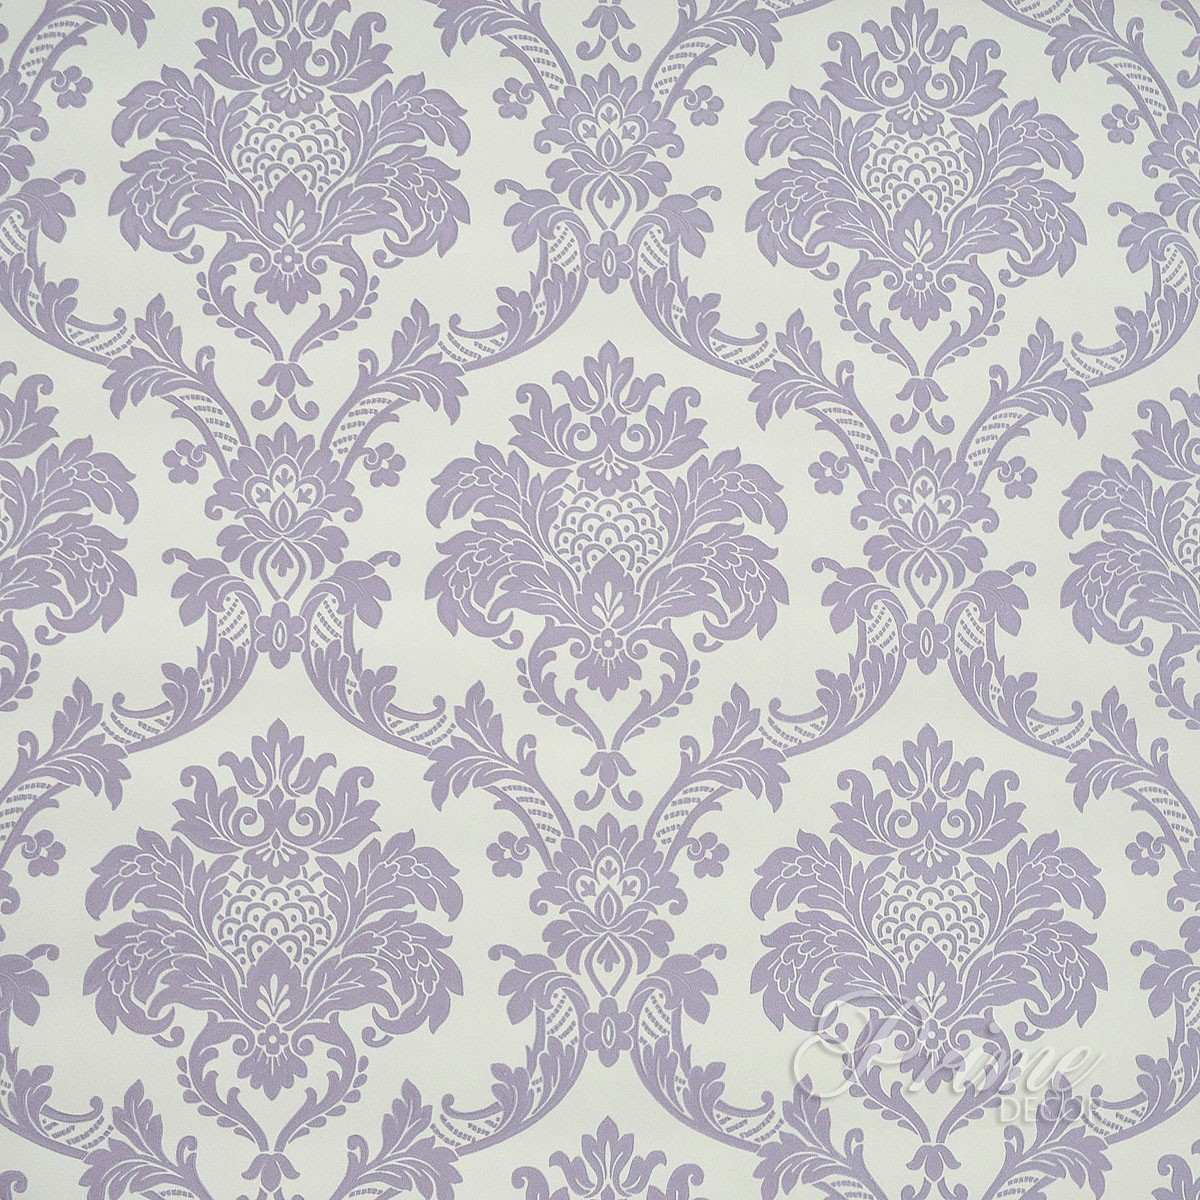 Papel de parede importado textura relevo damask roxo lil s for Papel para paredes catalogo